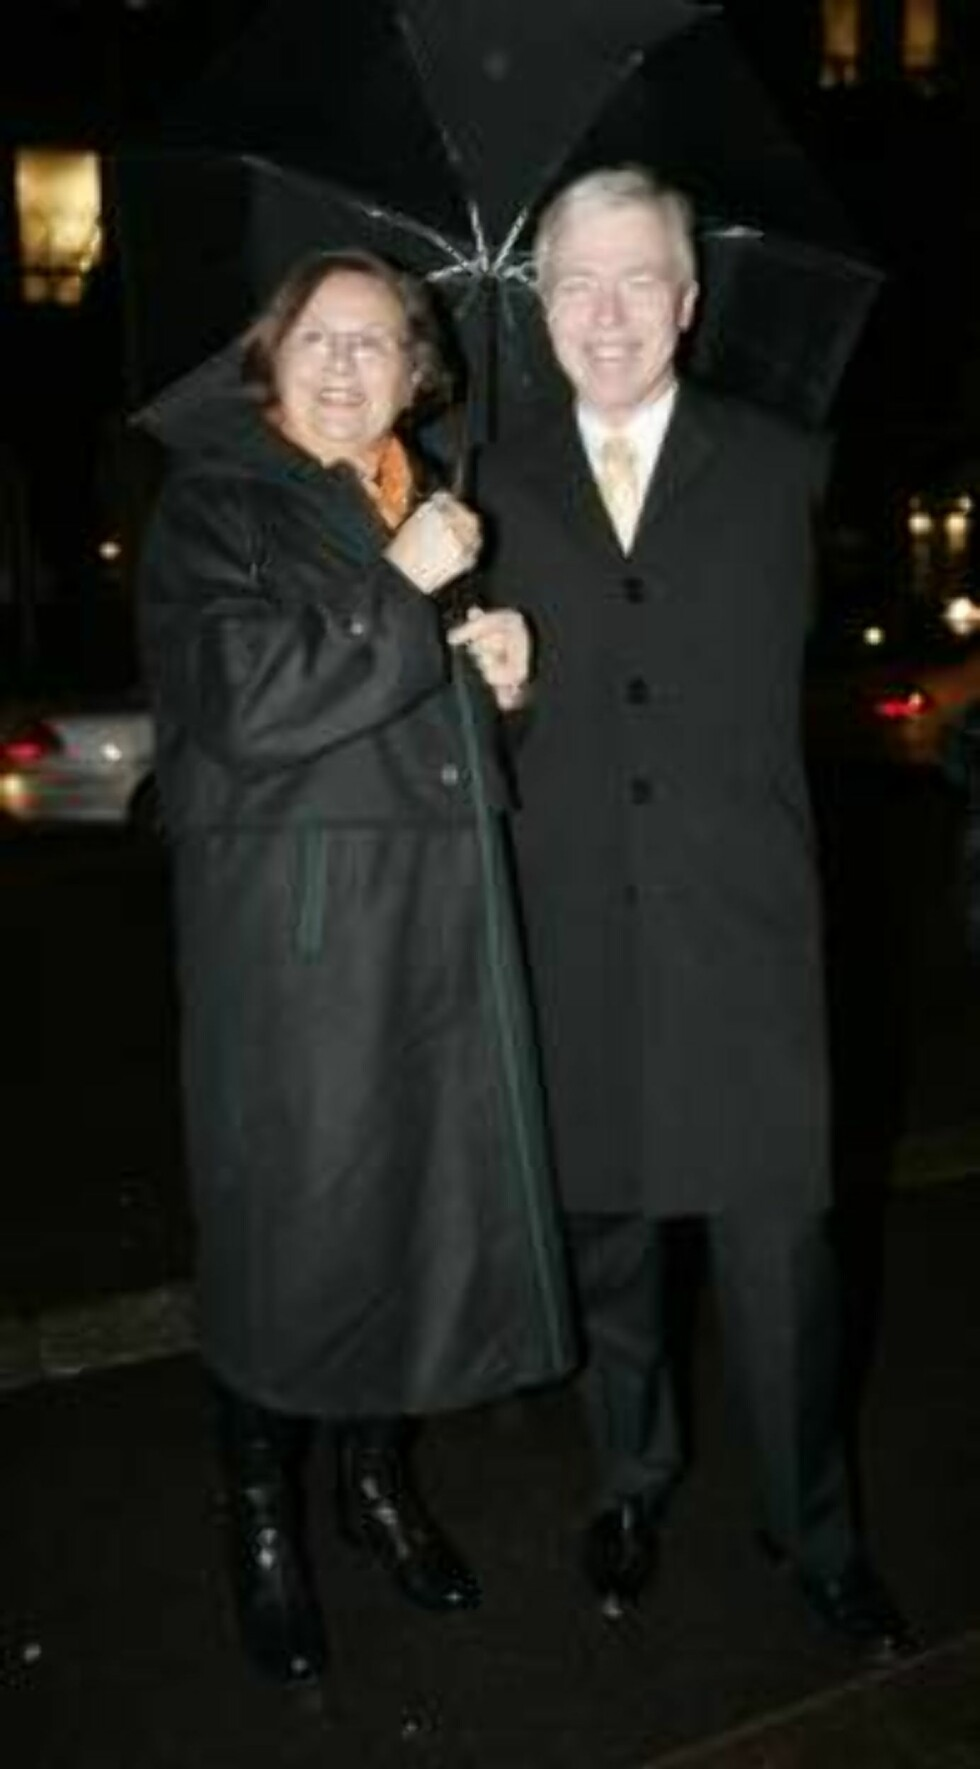 OSLO 2006-11-23; PREMIER MOTEBUTIKKEN LOUIS VUITTON I OSLO.  HER CATO ZAHL PEDERSEN OG KONA  FOTO: MARIUS GULLIKSRUD CODE 5008 COPYRIGHT STELLA PICTURES. Foto: STELLA PICTURES